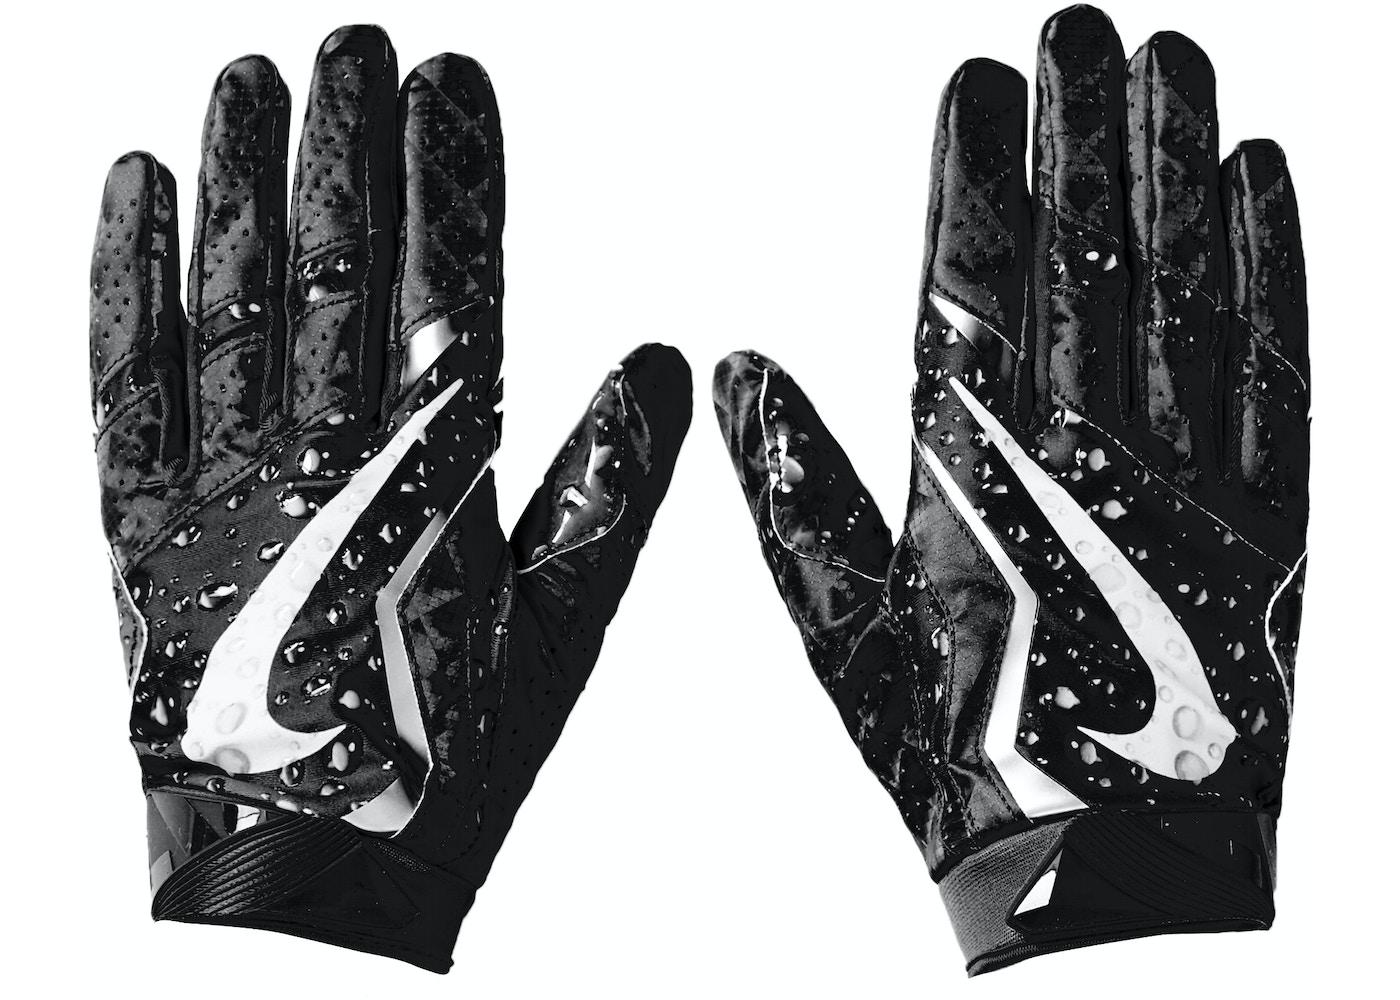 66d17600c4f Supreme Nike Vapor Jet 4.0 Football Gloves Black - FW18